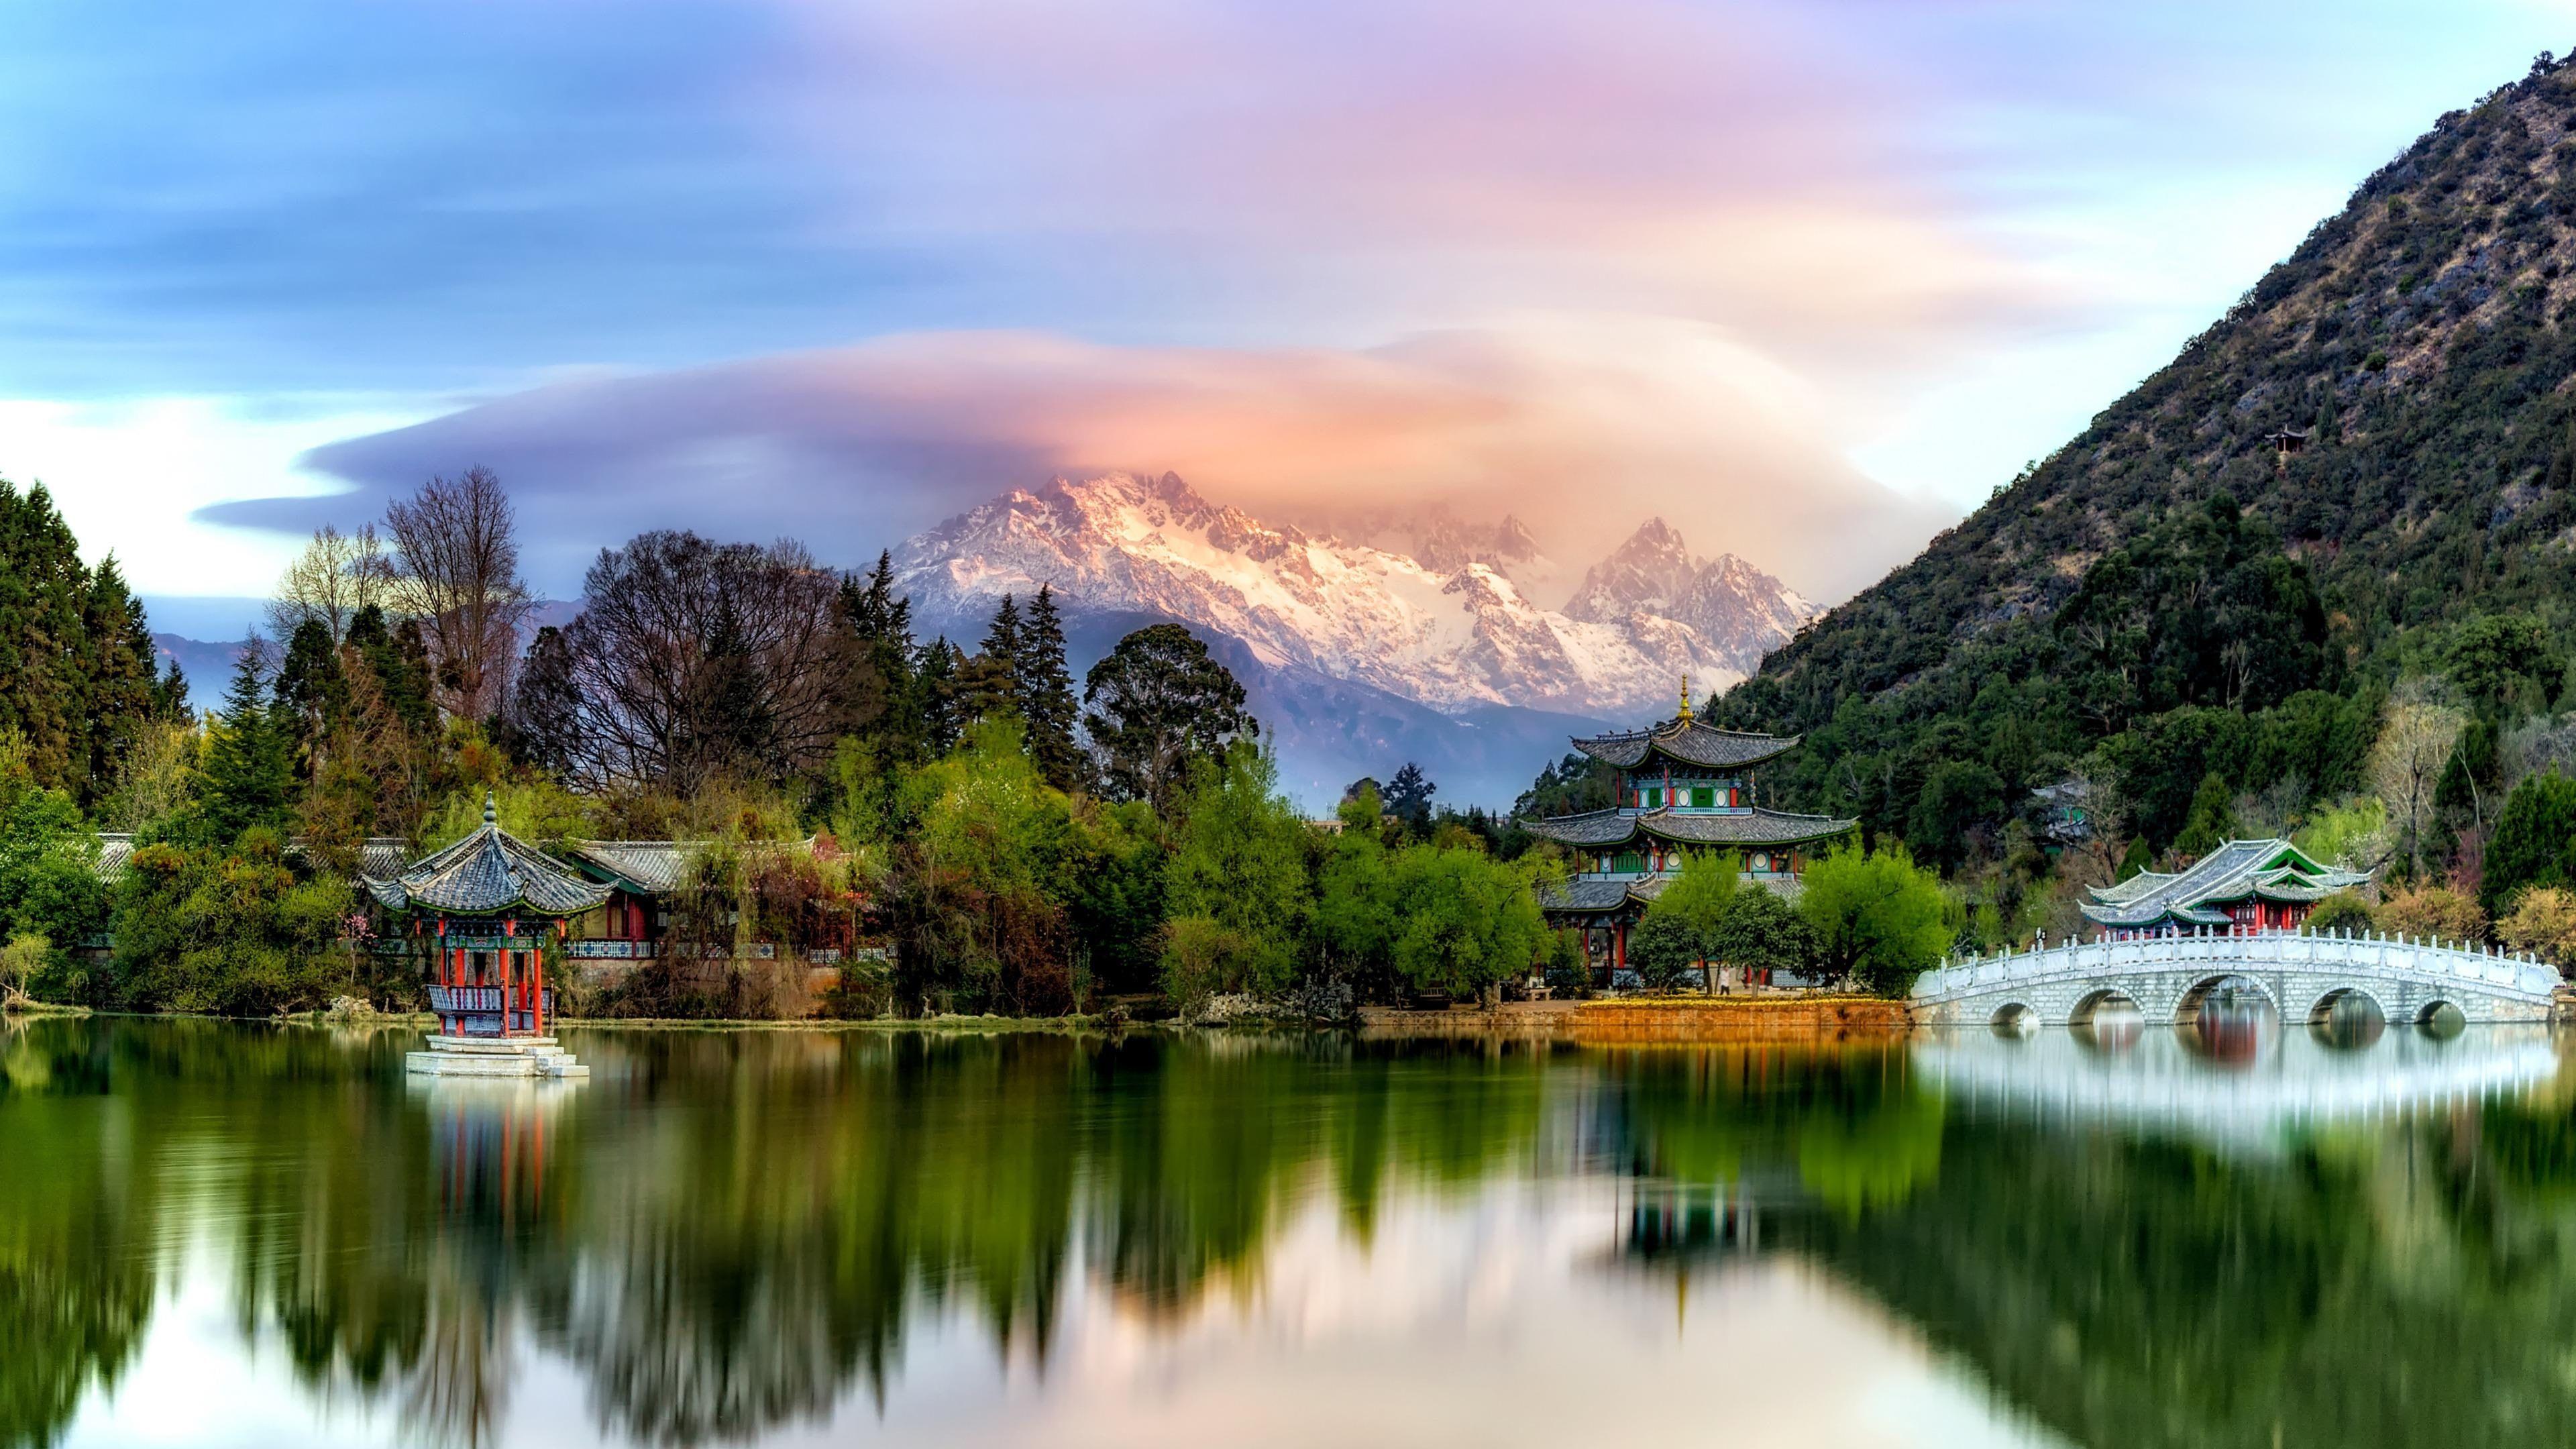 #park #mountain snow mountain jade dragon snow mountain #lake #reflection #china yun nam #lijiang #town #4K #wallpaper #hdwallpaper #desktop